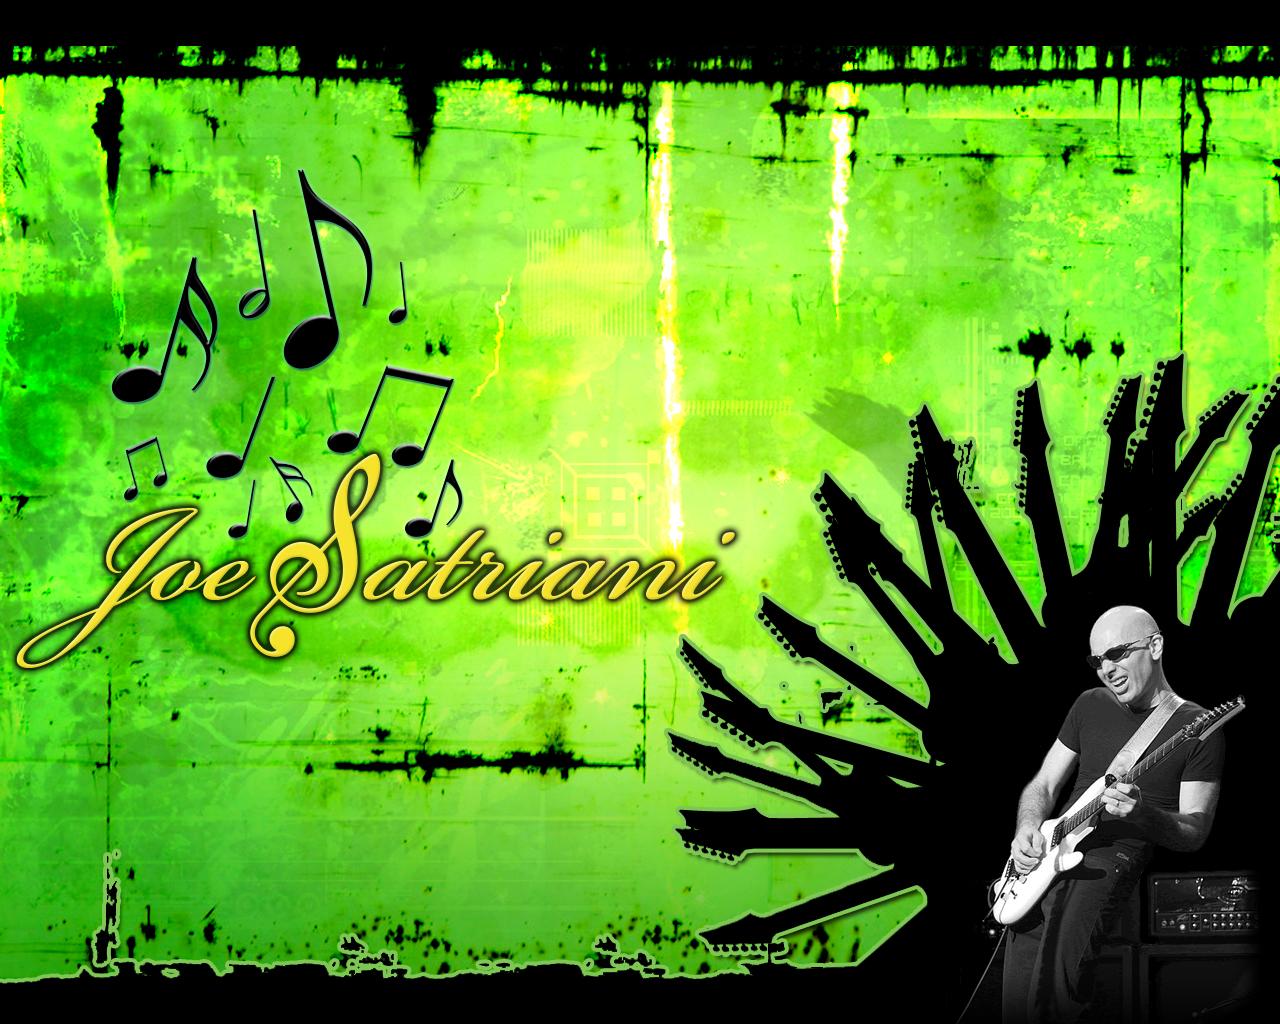 Joe Satrianis wallpapers 1280x1024